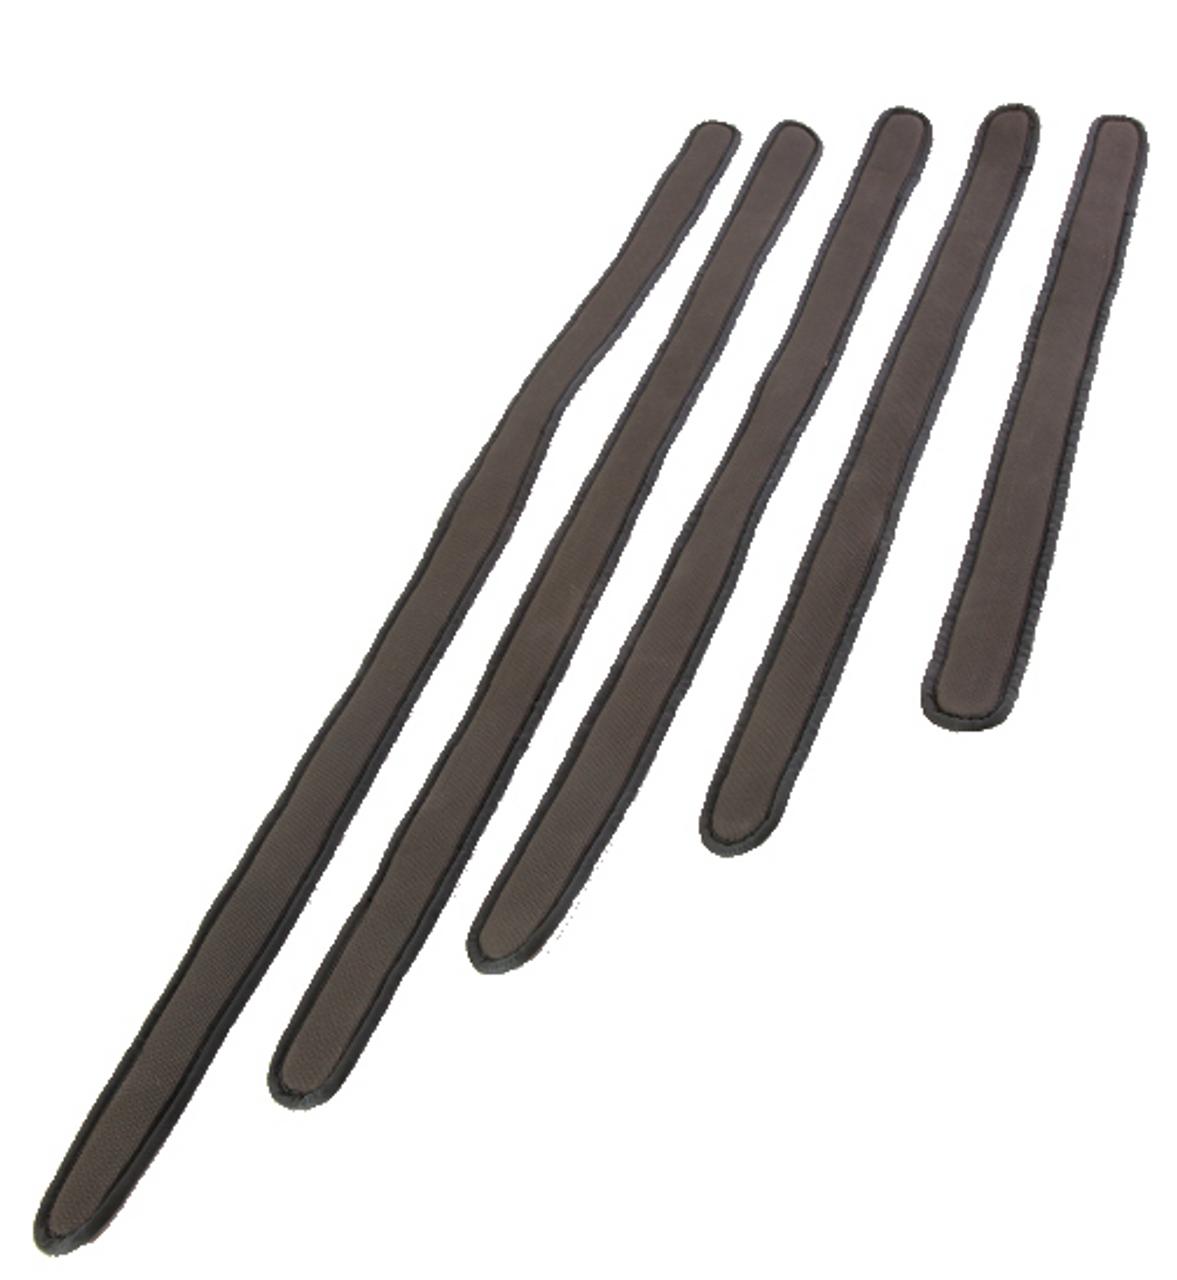 HSGI Micro Grip Belt Panel - Medium (Black)